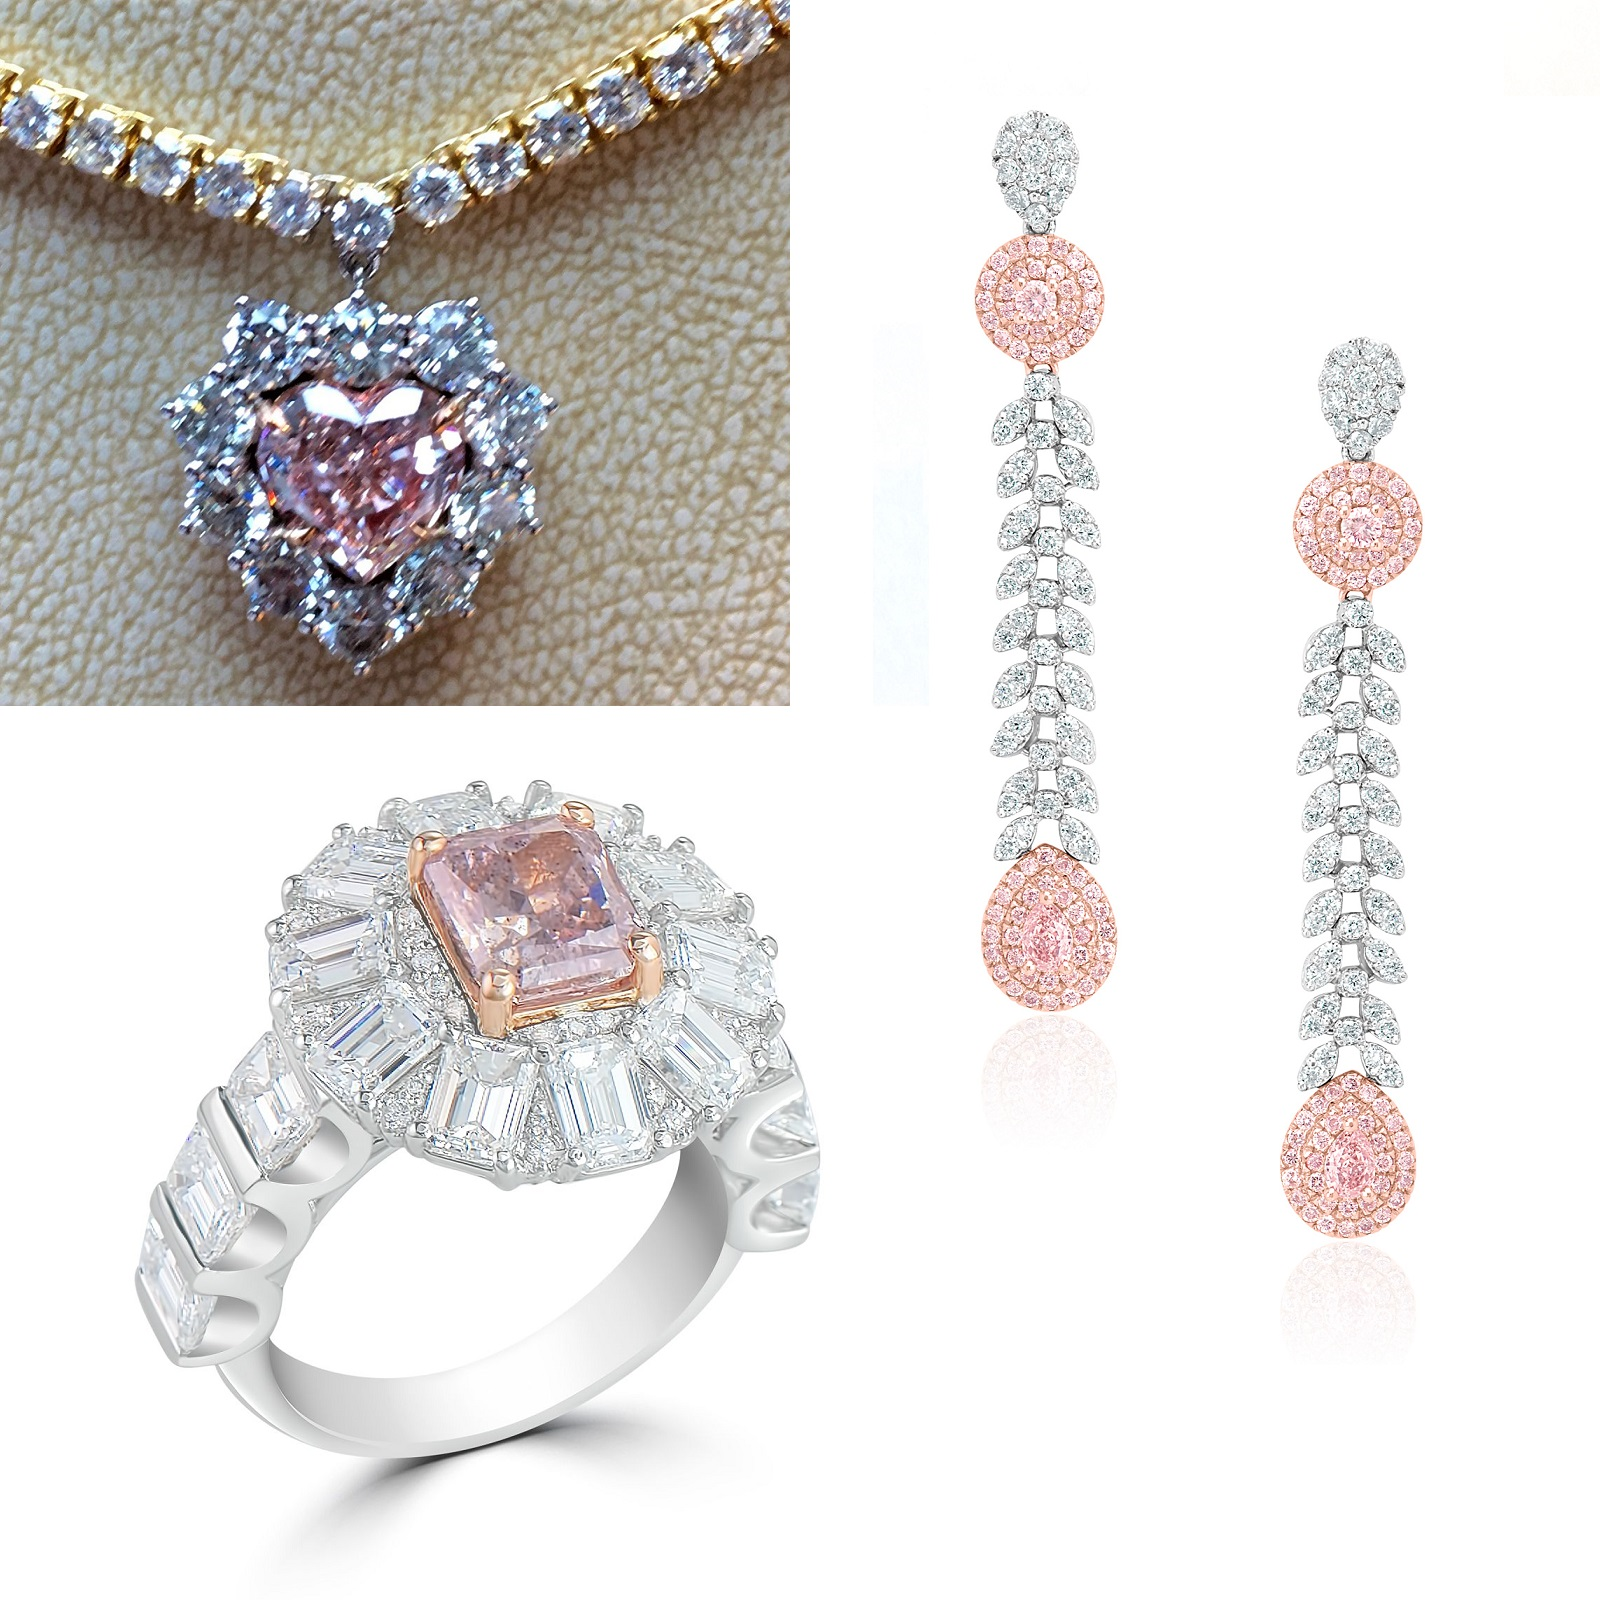 Mixed Pink Diamond Ring, Pendant & Earrings Set (25.64ct TW)